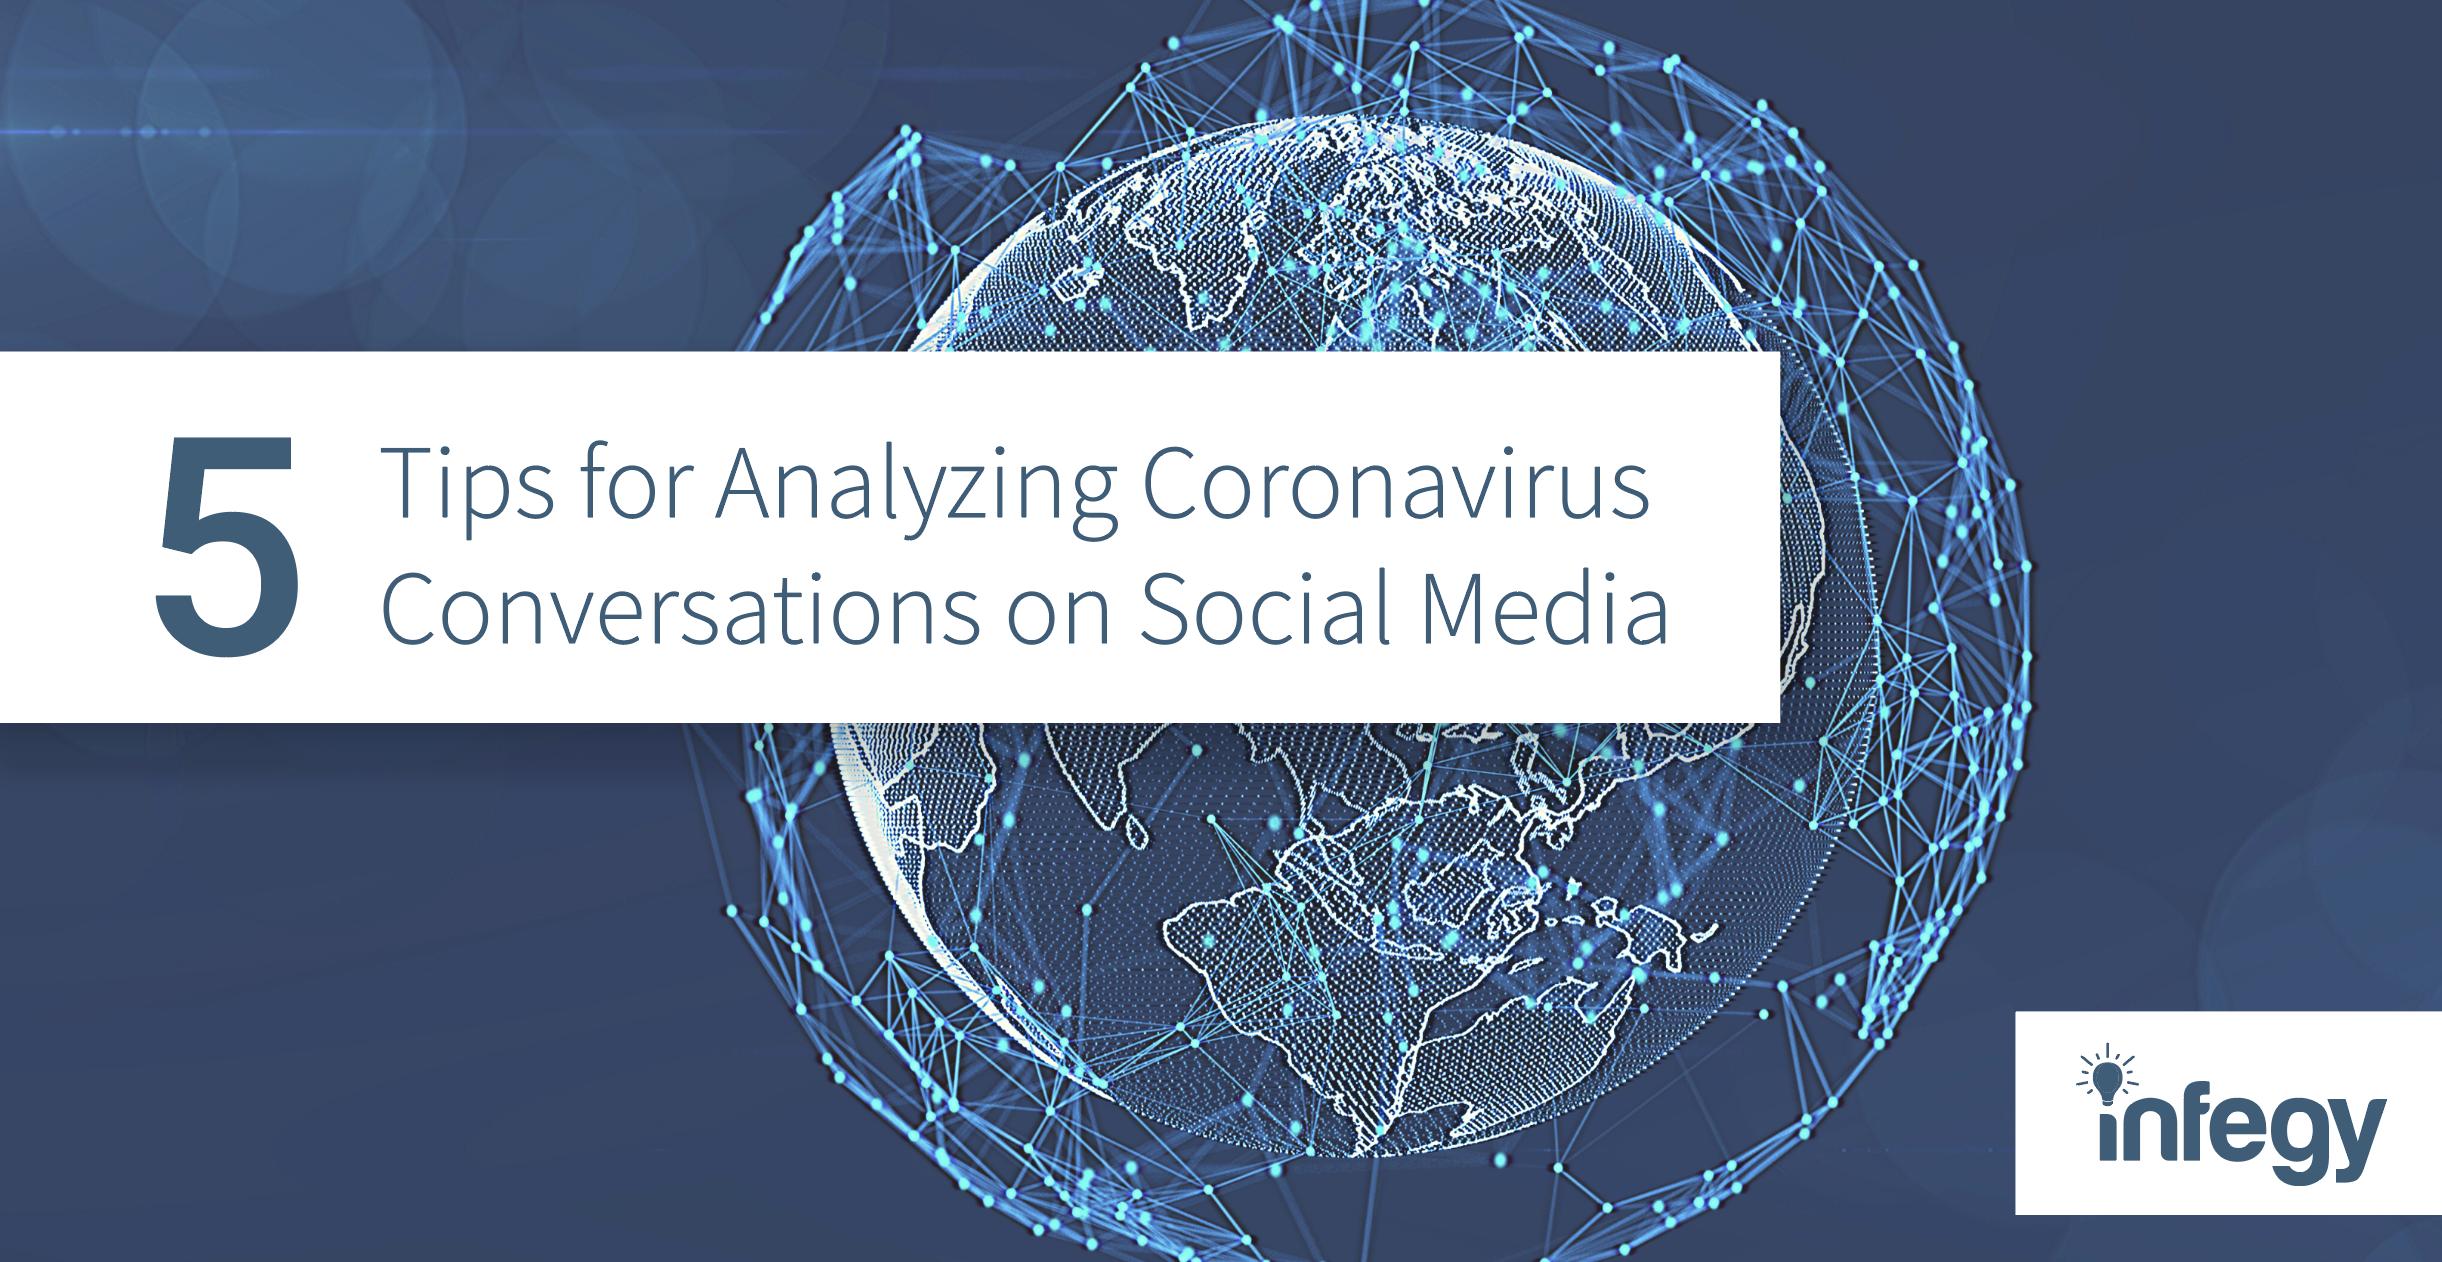 Coronavirus data on social media